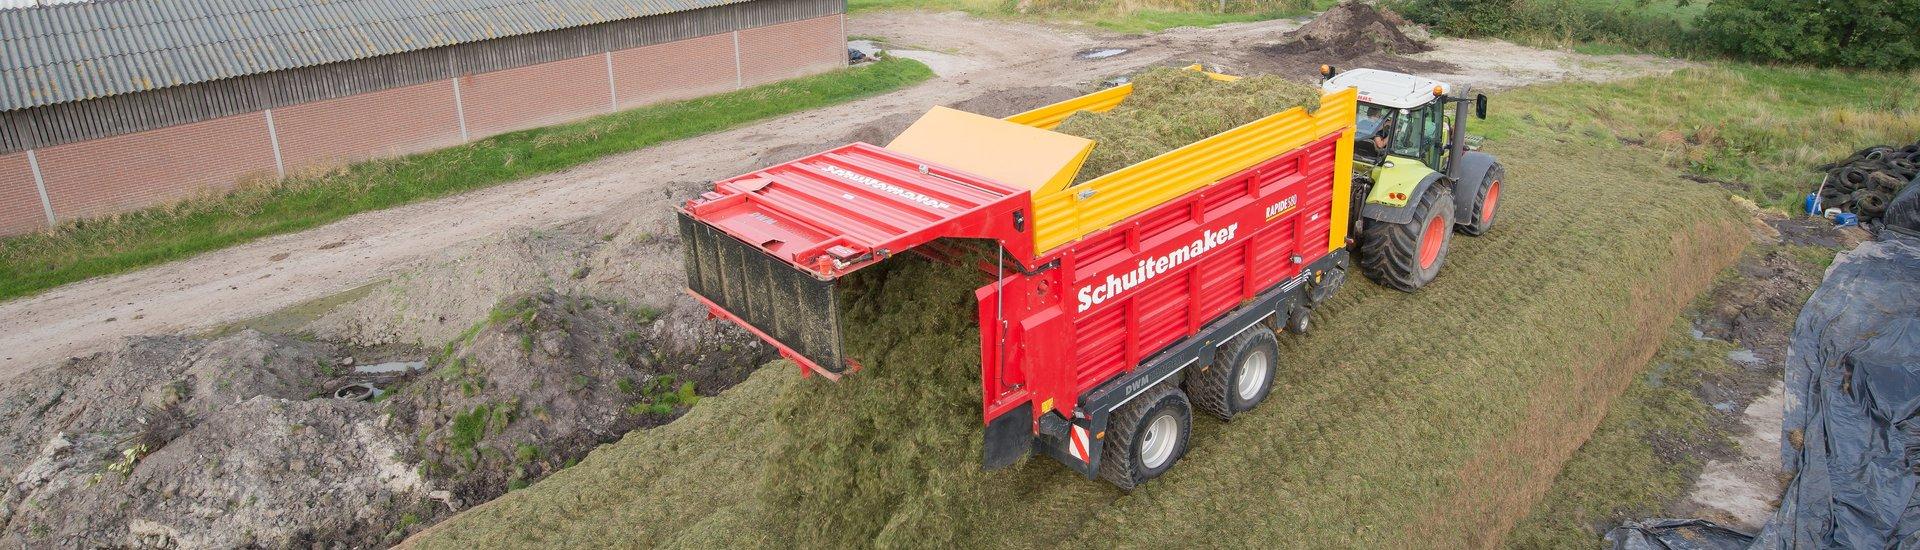 Schuitemaker Rapide feedingwagon